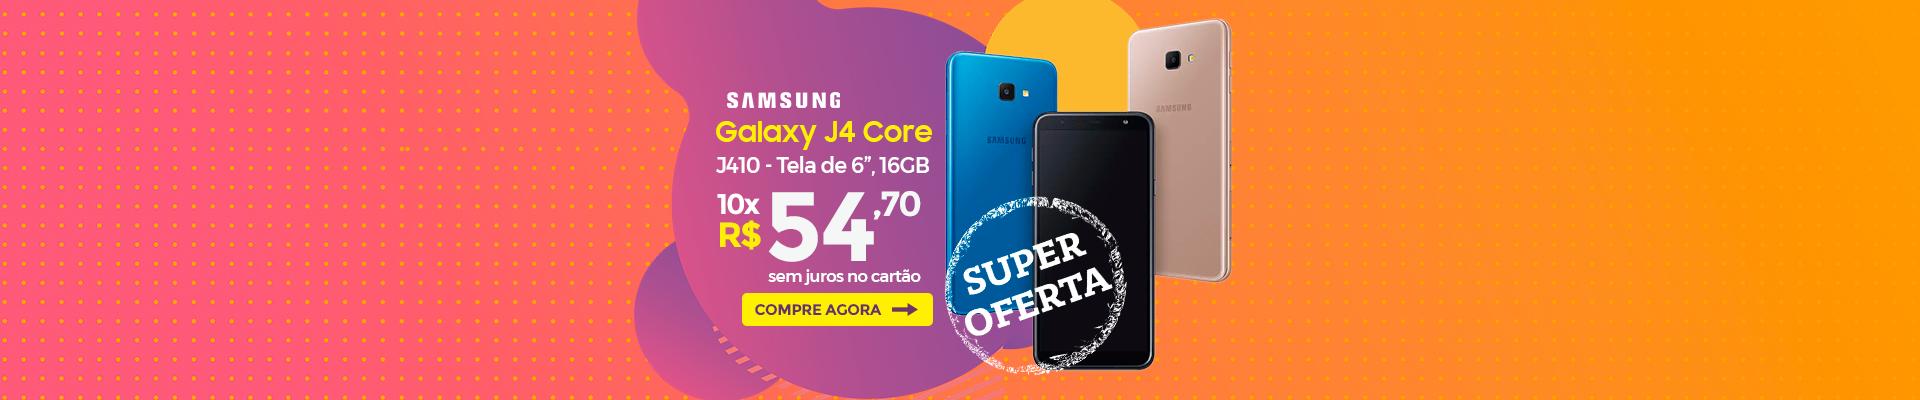 AGOSTO - Samsung J410